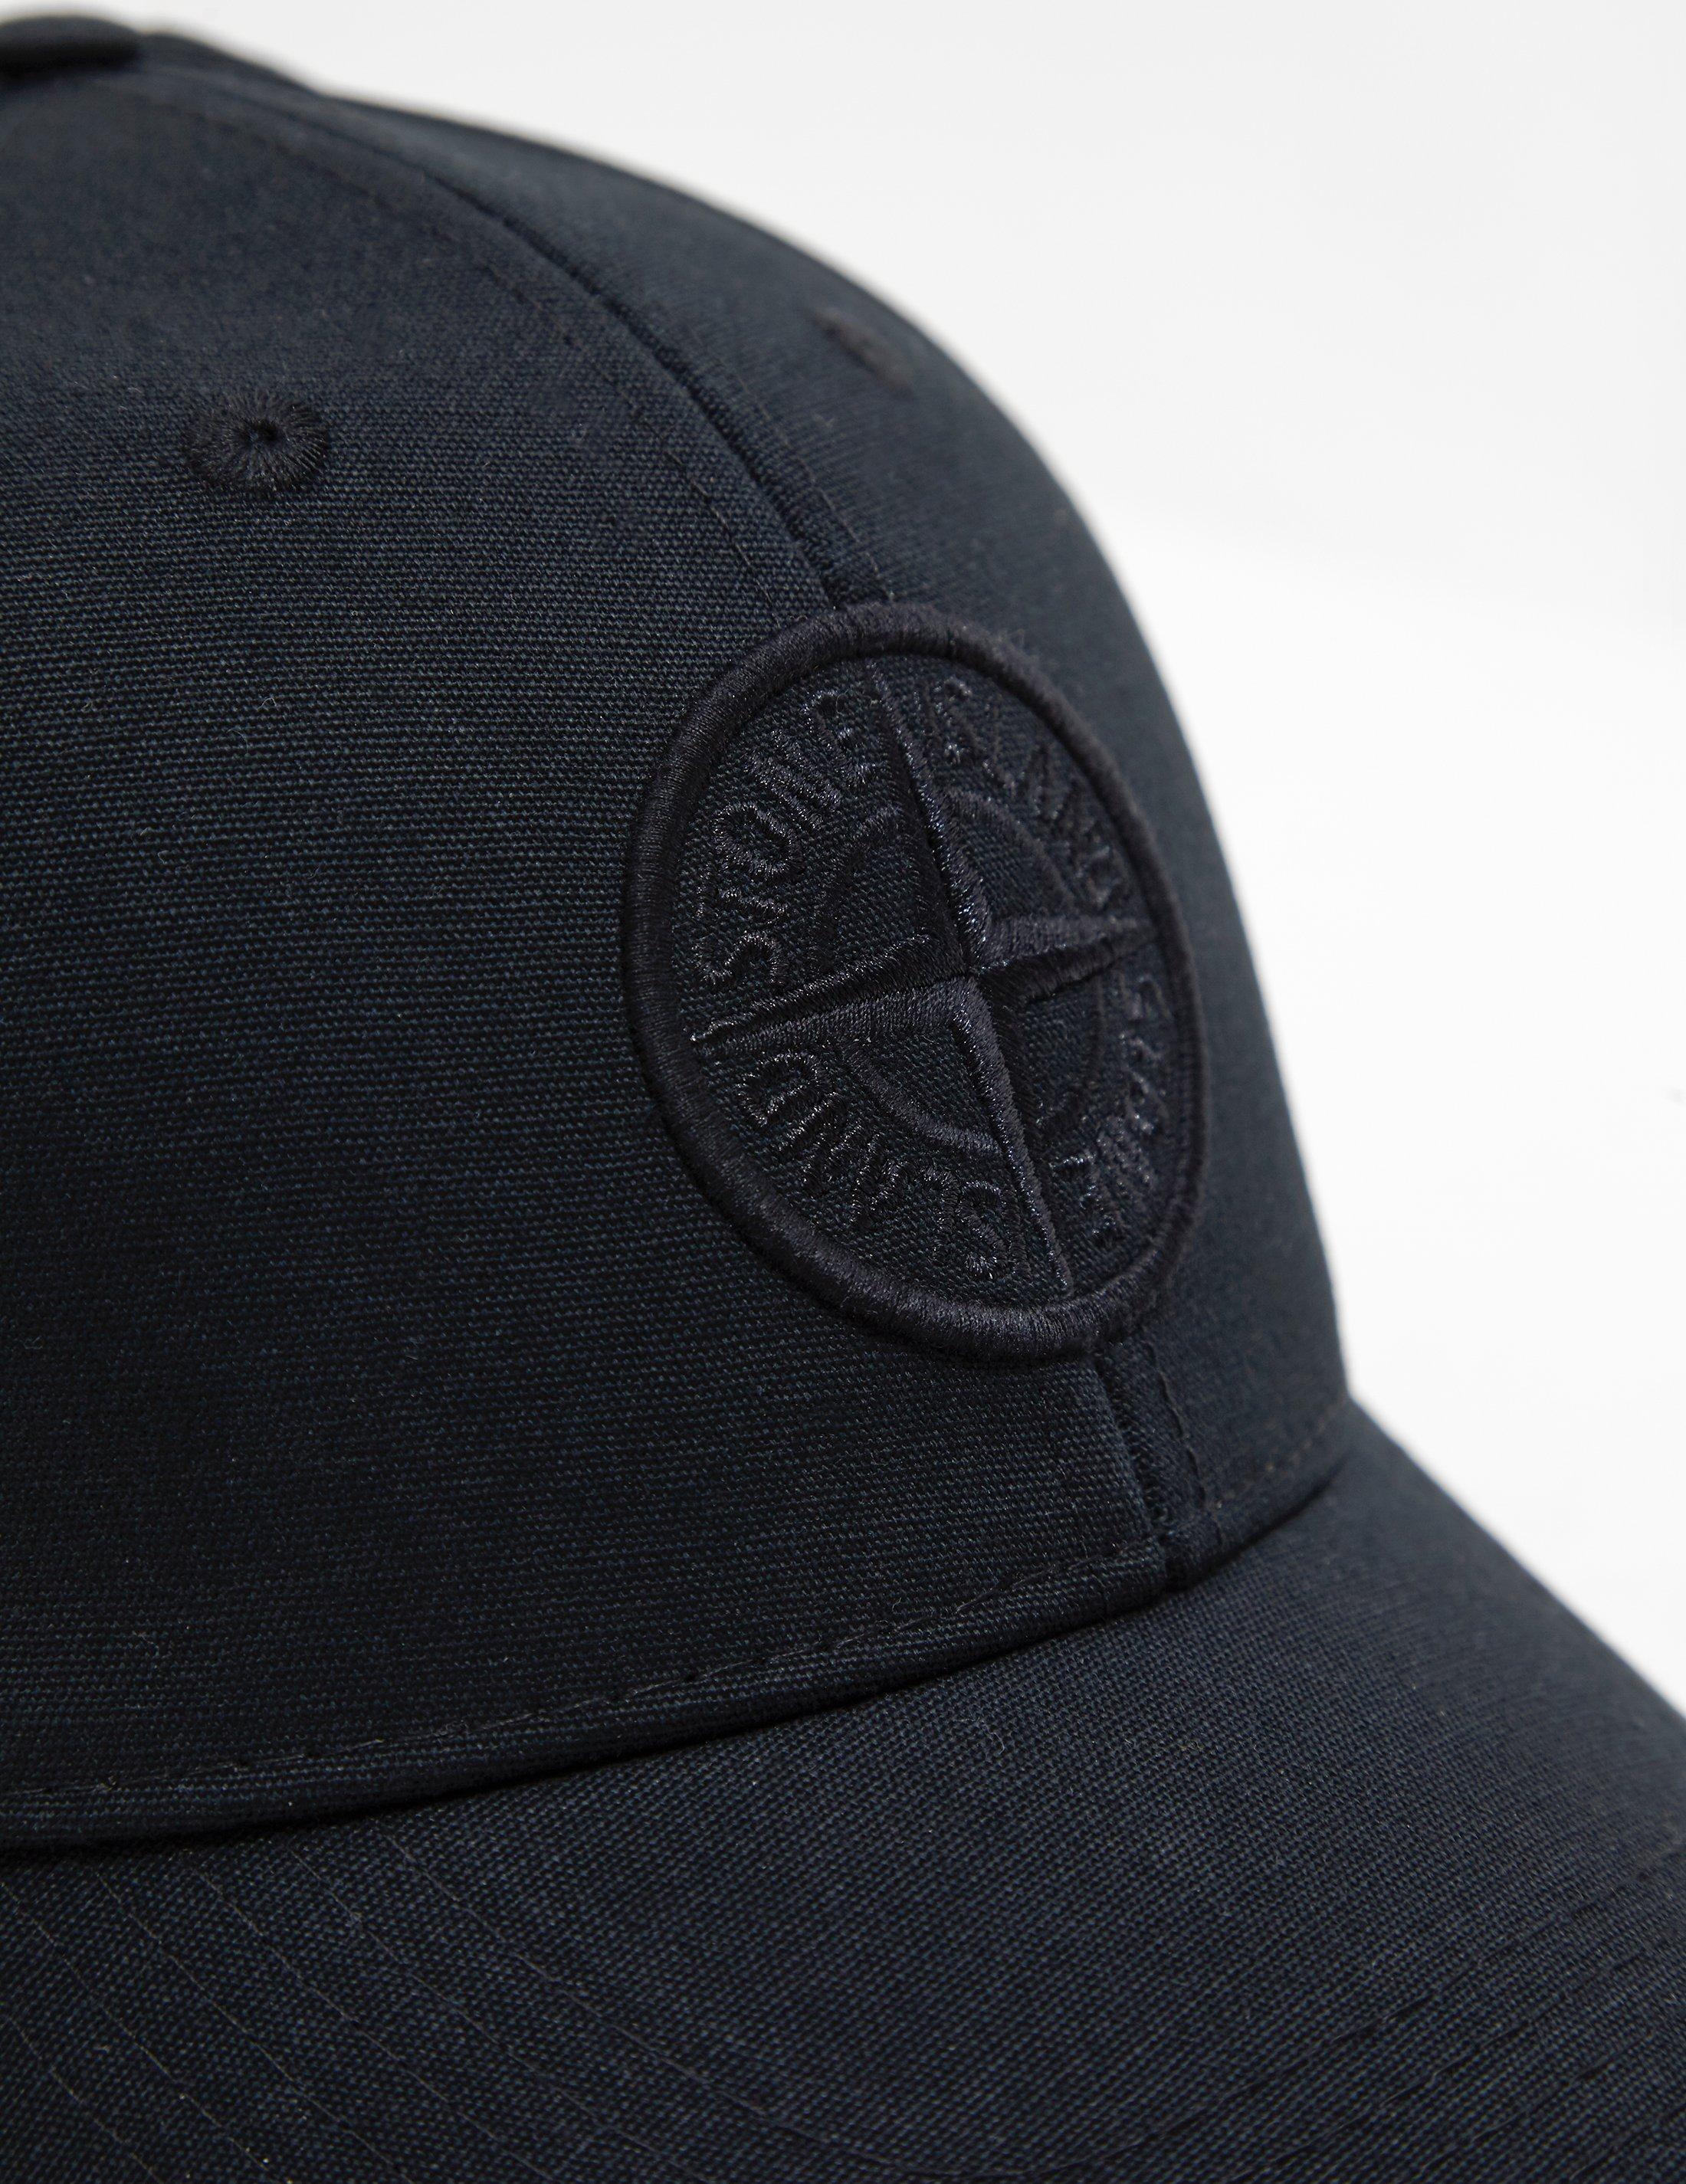 0b3881a62ba Lyst - Stone Island Mens Pin Cap Black in Black for Men - Save  5.6910569105691025%